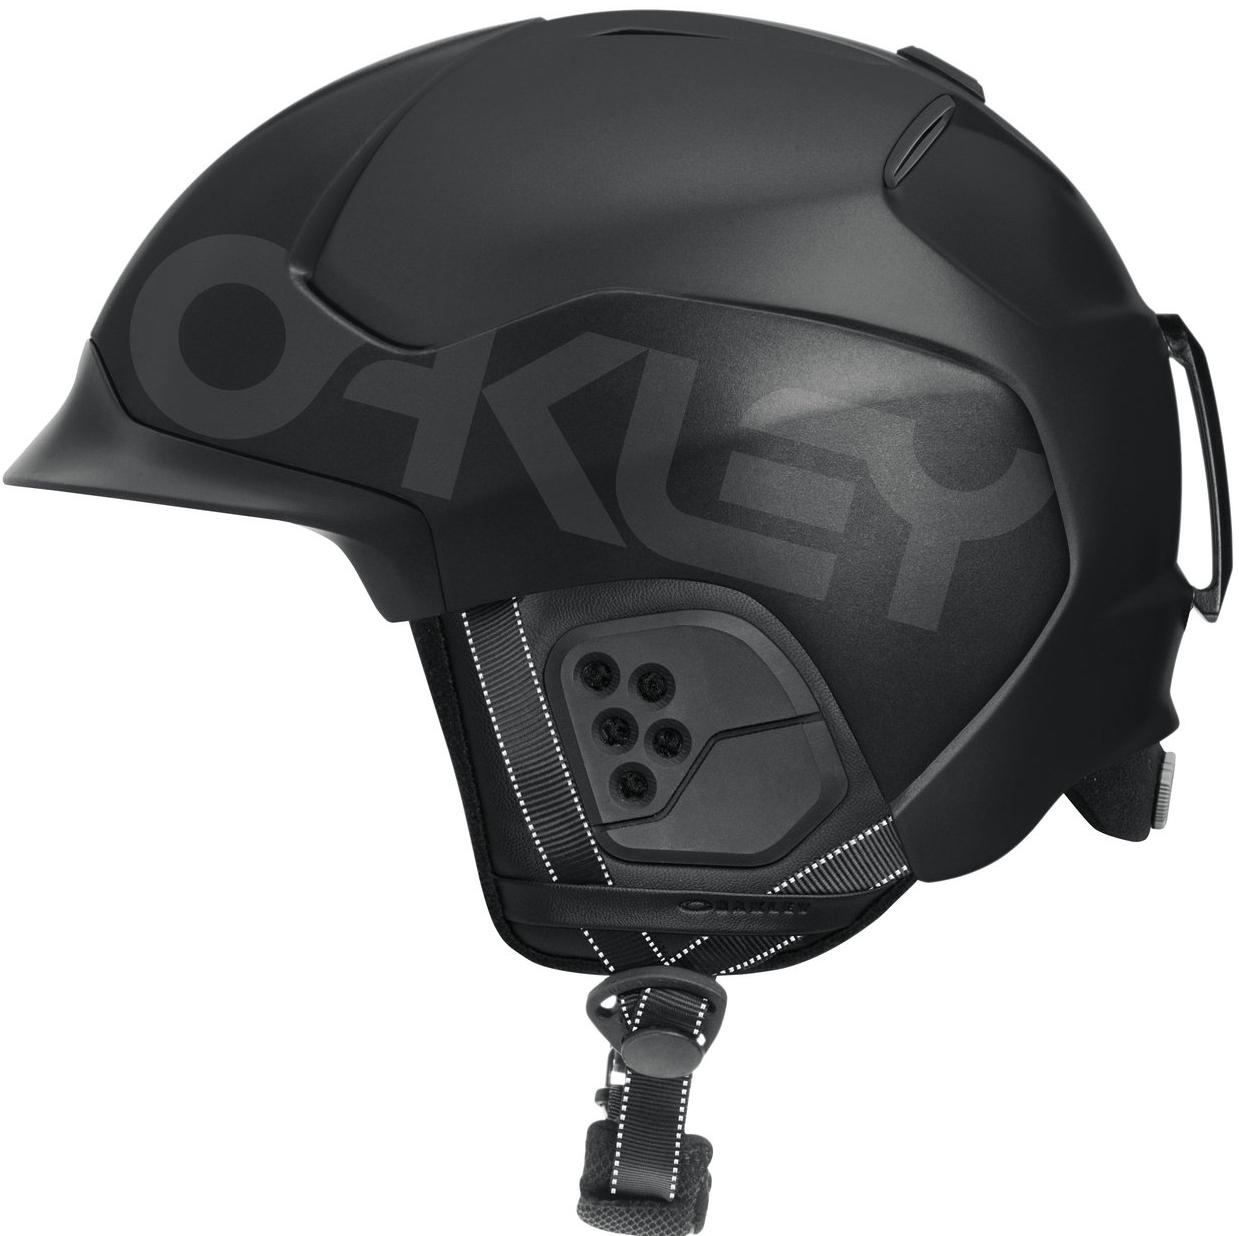 Oakley MOD 5 Premium Helmet, $209.95